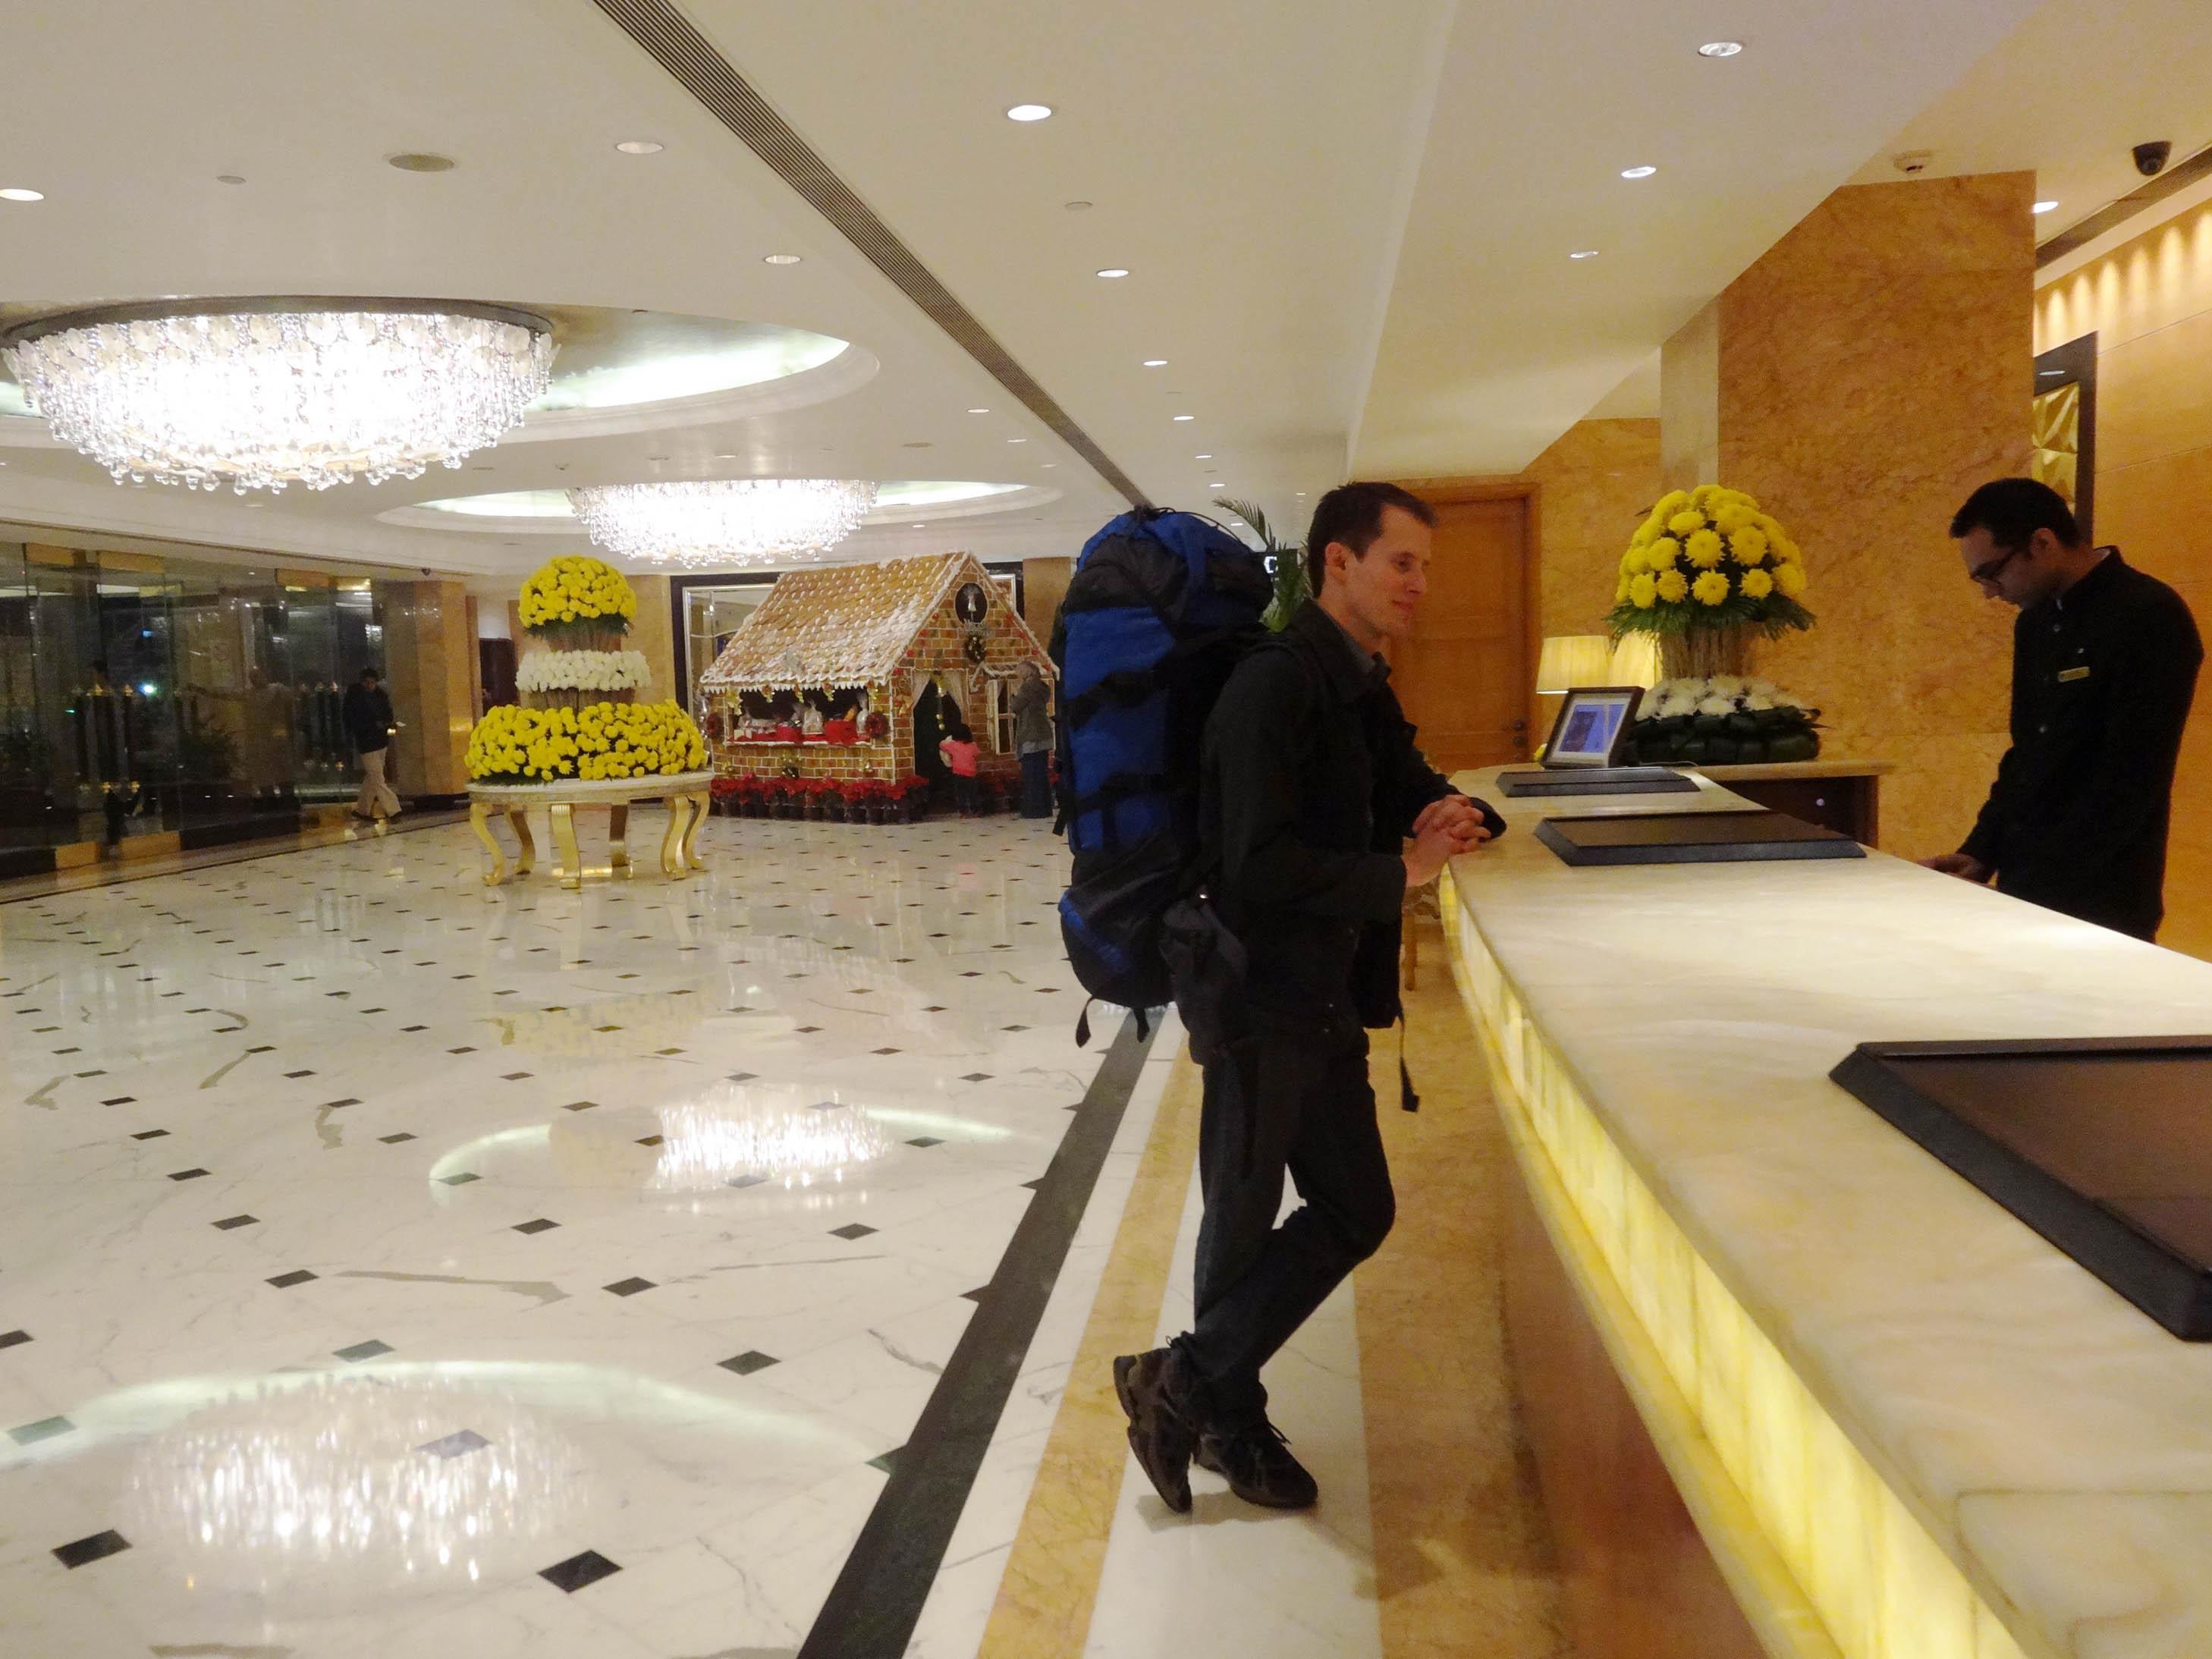 daniel mit backpack an der shangri-la hotel rezeption